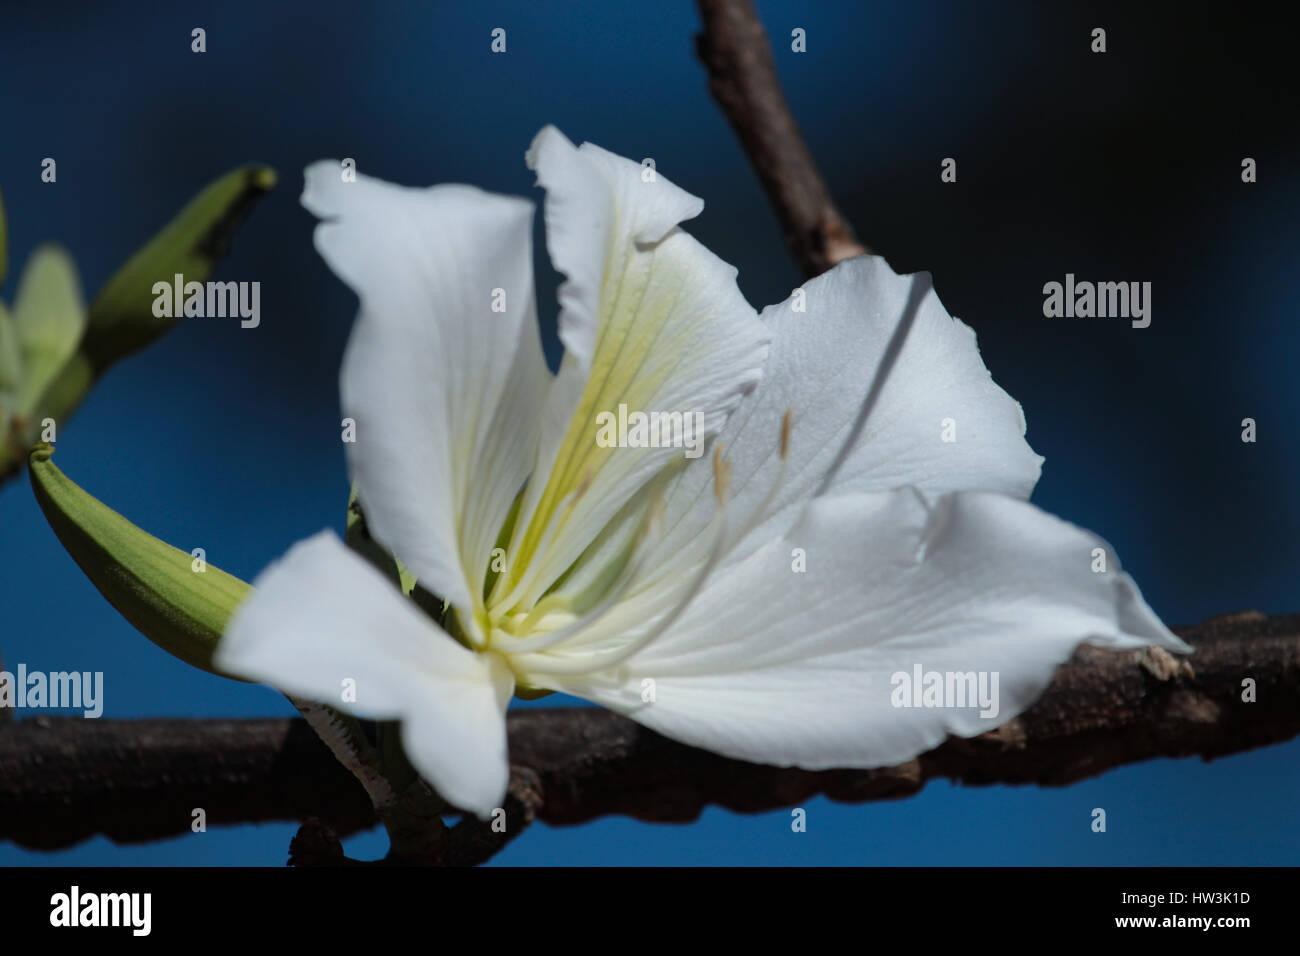 The white flower of Bauhinia variegata 'Candida' in blue sky. Brasilia, DF, Brazil. - Stock Image